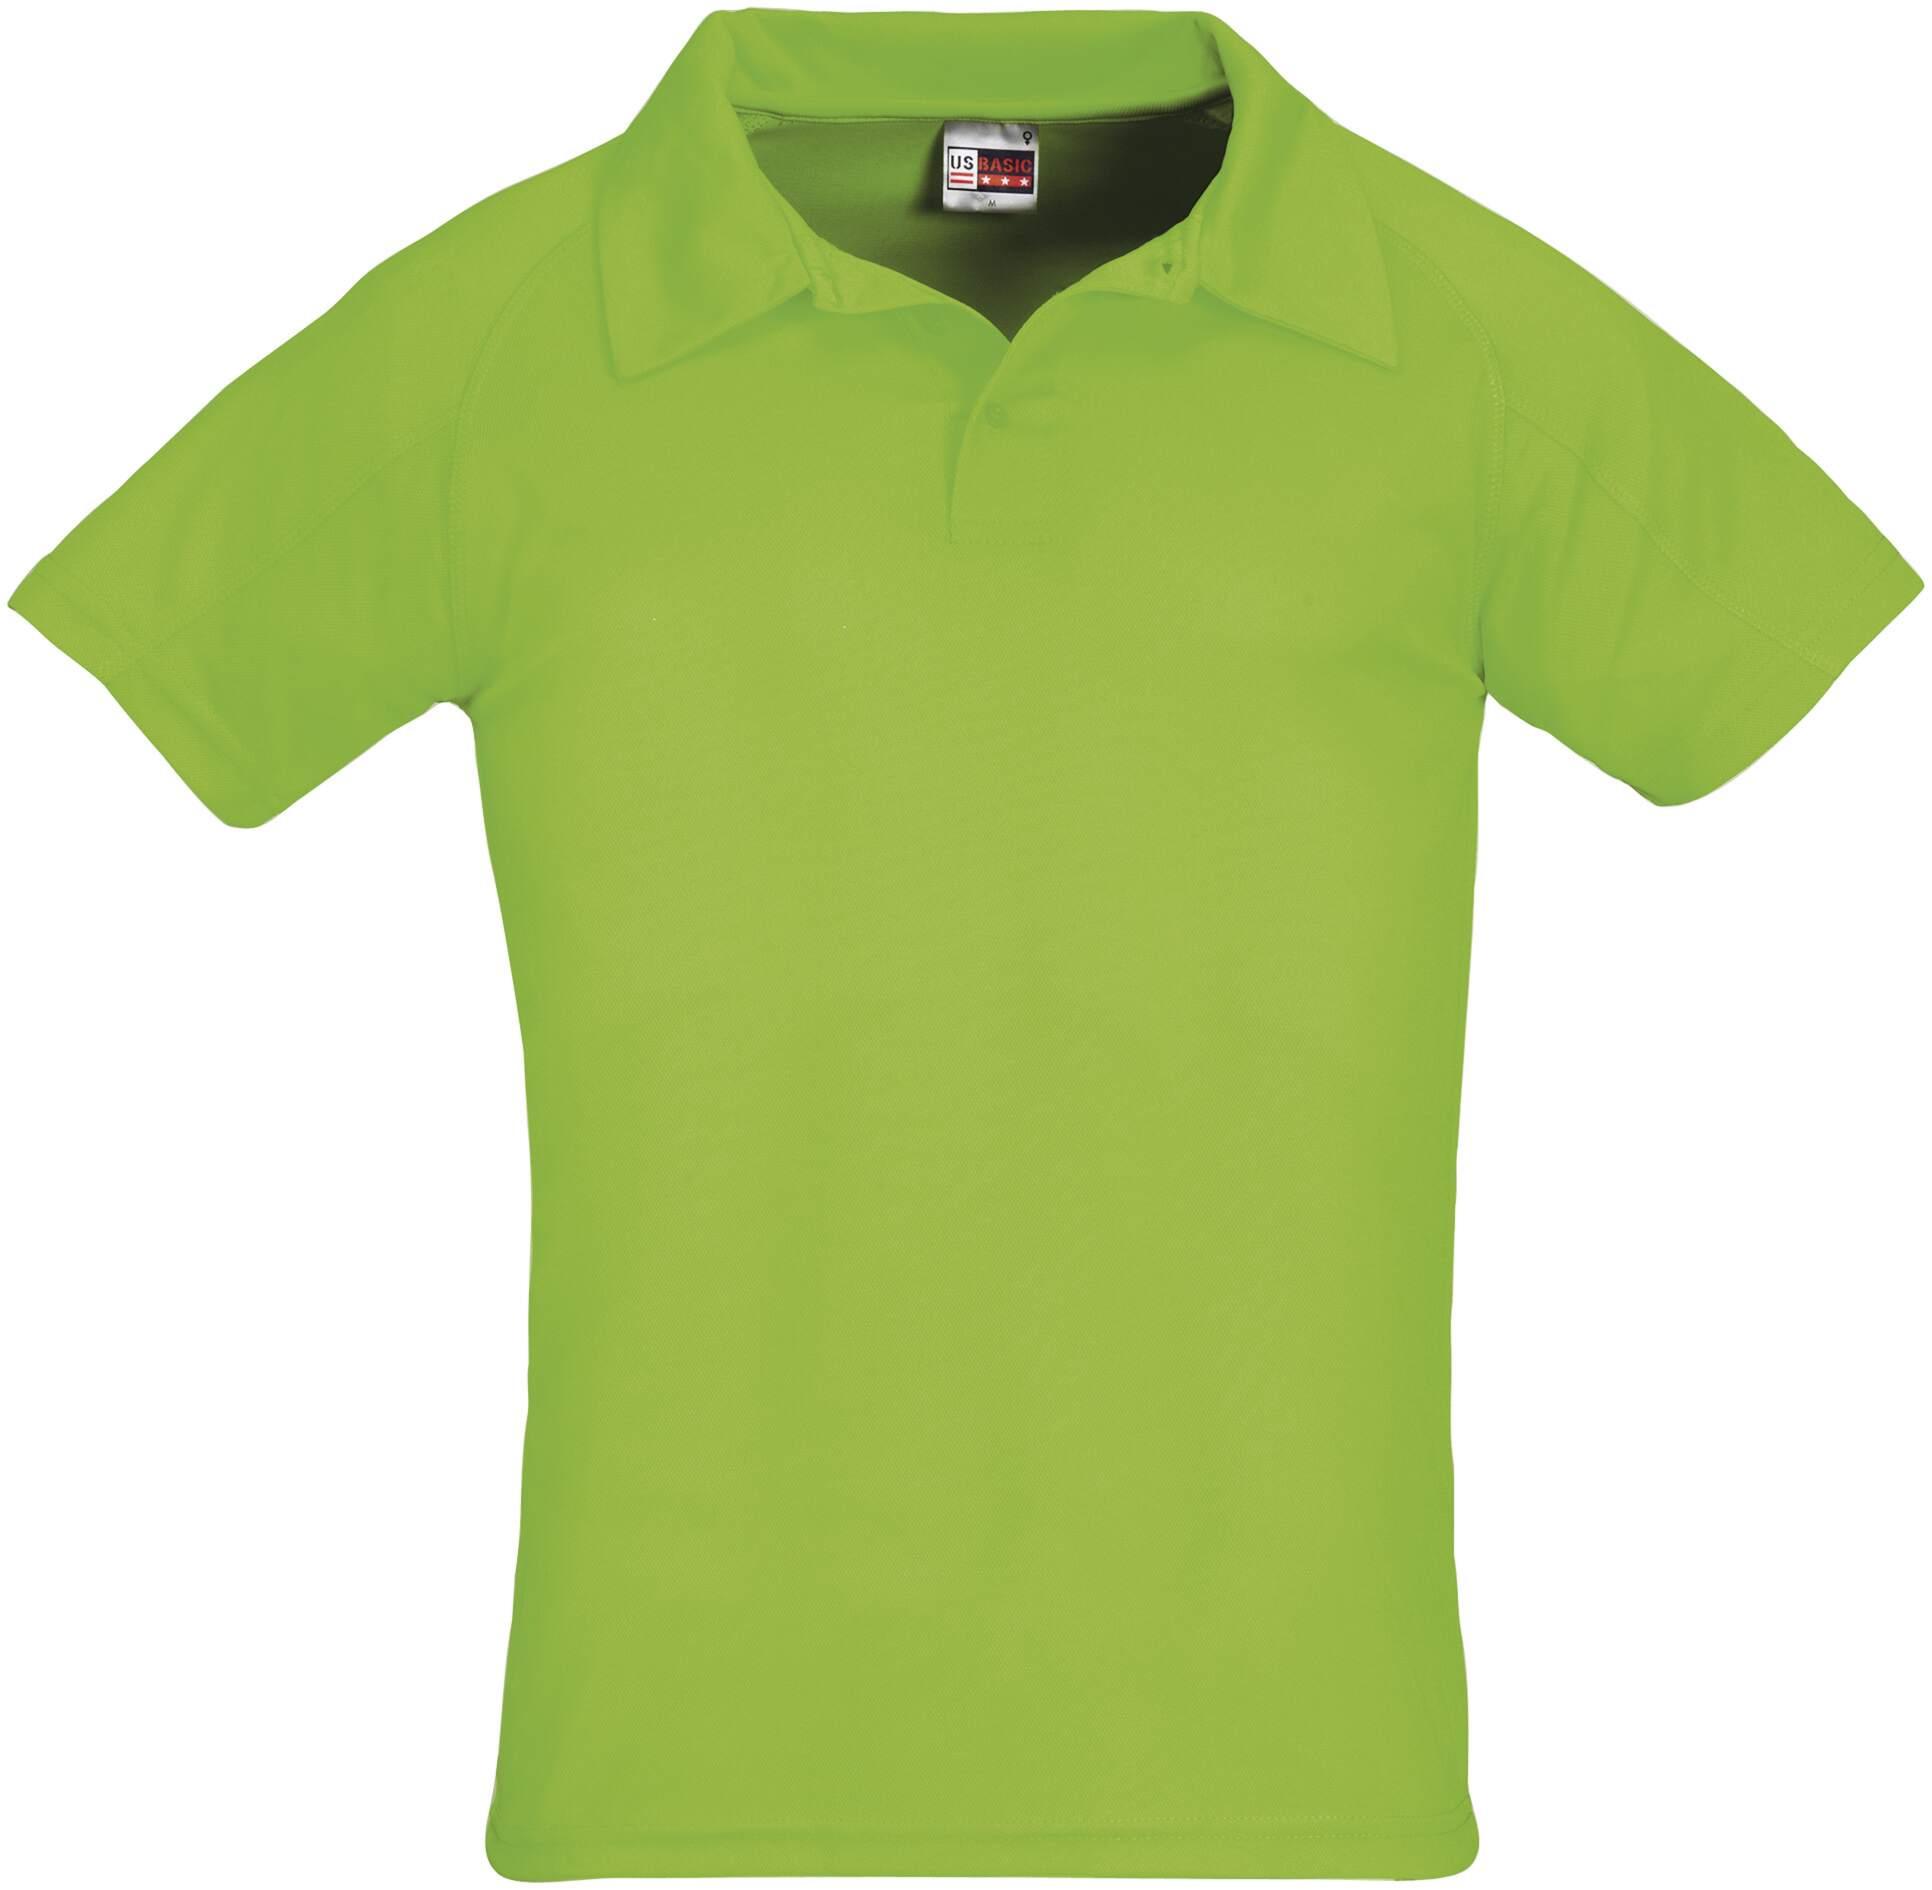 Koszulki Polo US 31098 Cool Fit - 31098_zielony_US - Kolor: Zielony